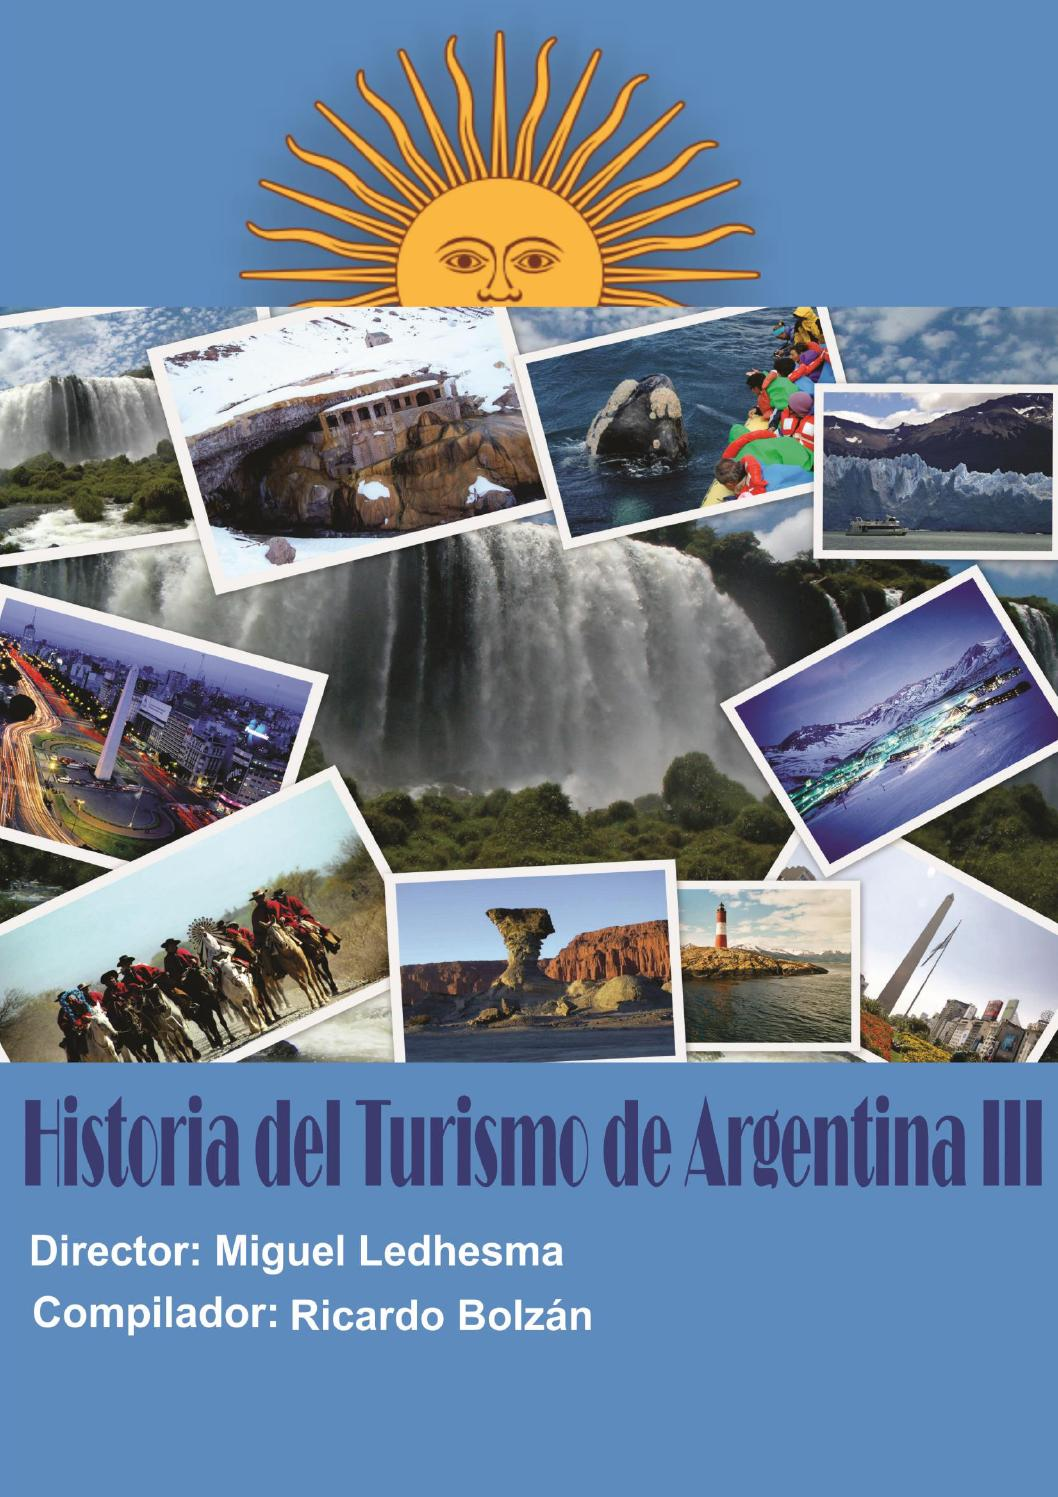 Historia del turismo de Argentina I by Miguel Ledhesma - Issuu